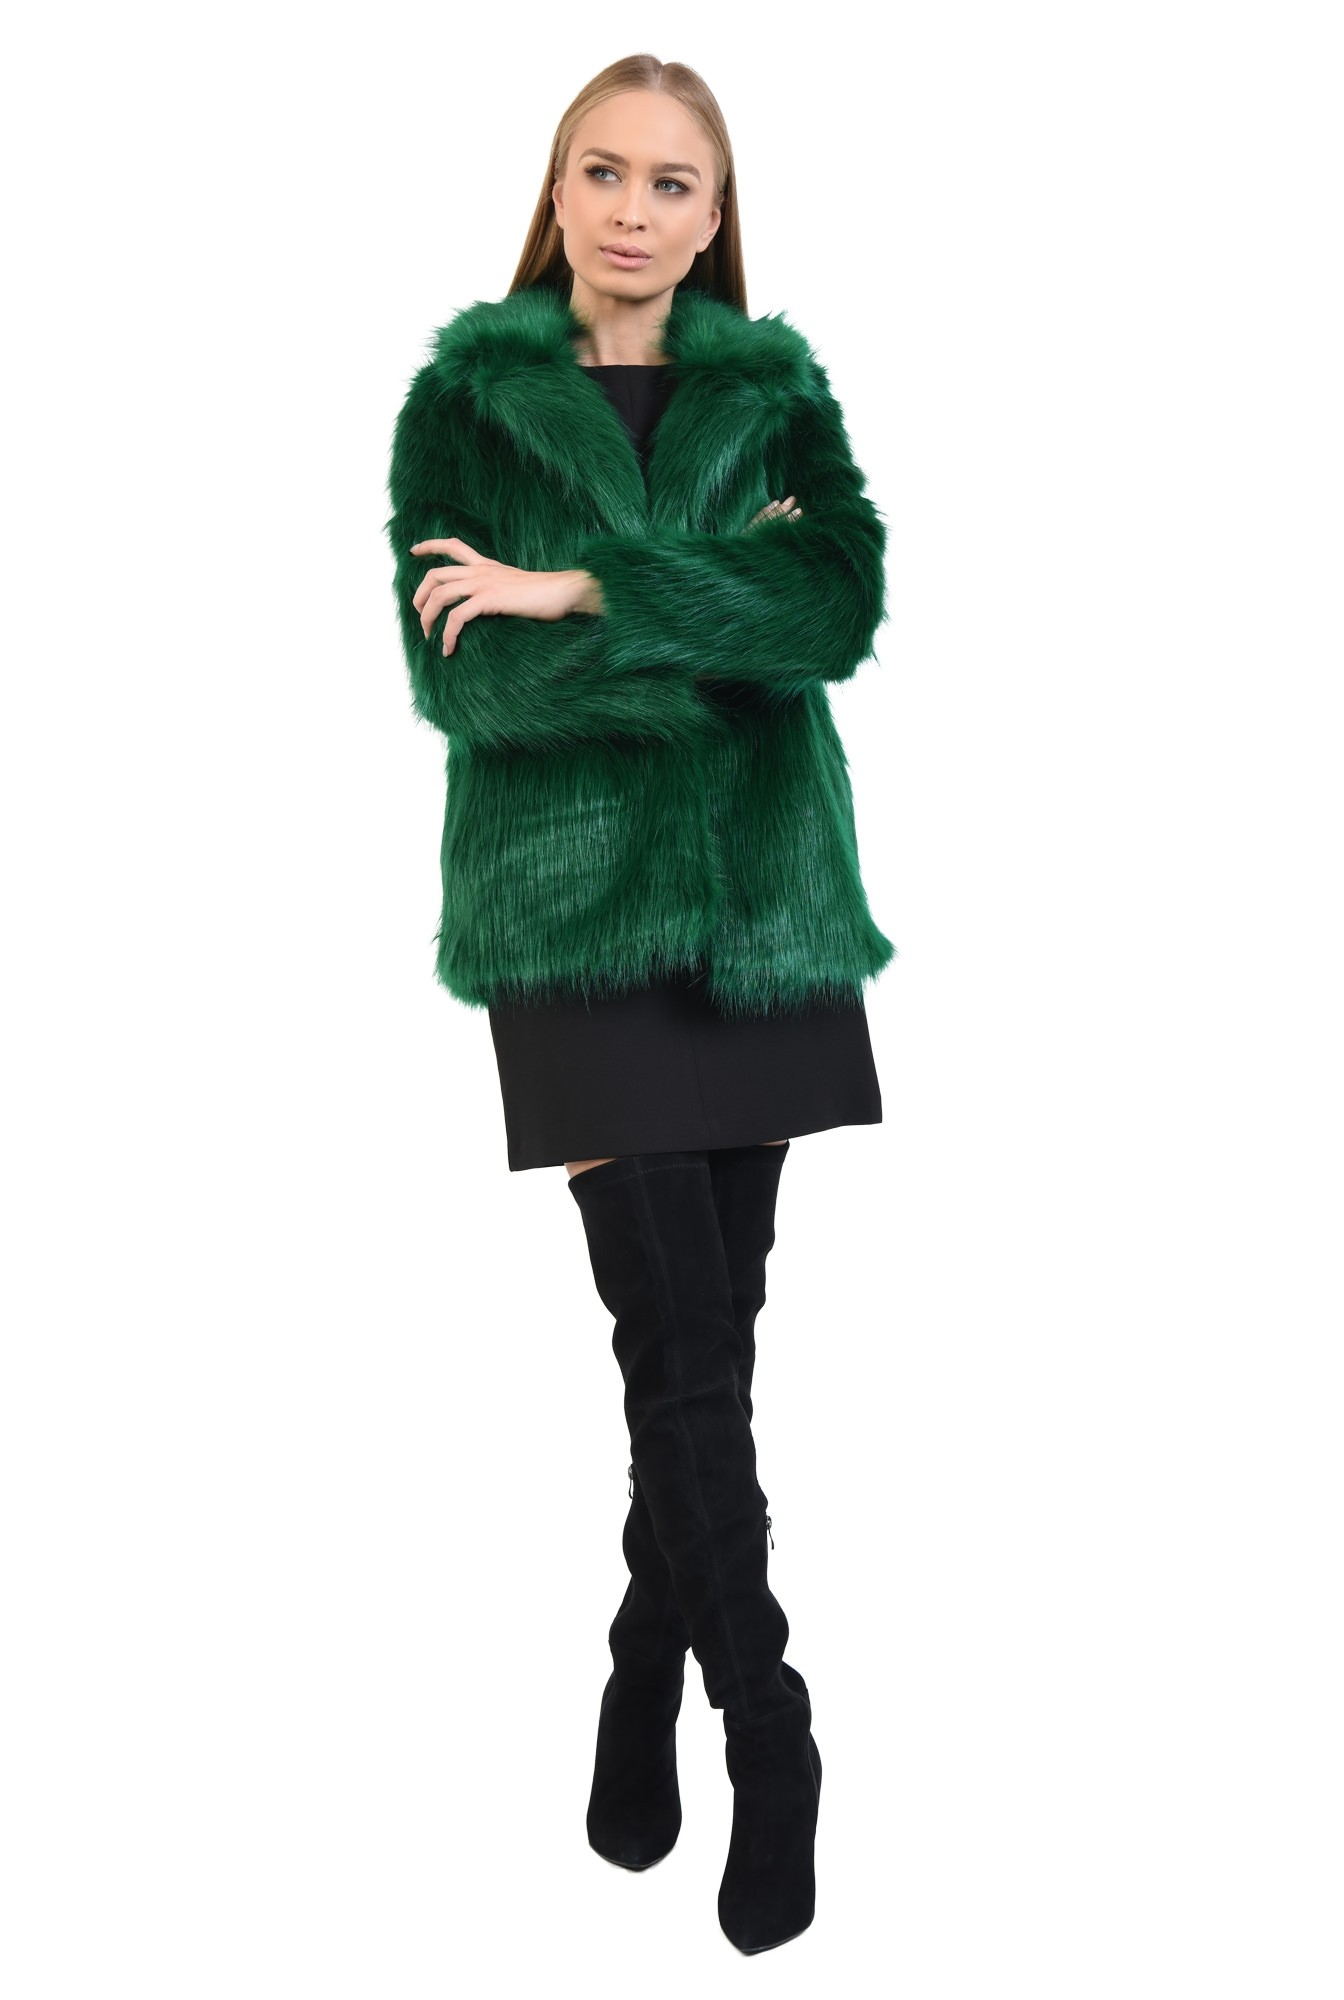 0 - haina din blana ecologica, dreapta, guler cu revere, verde